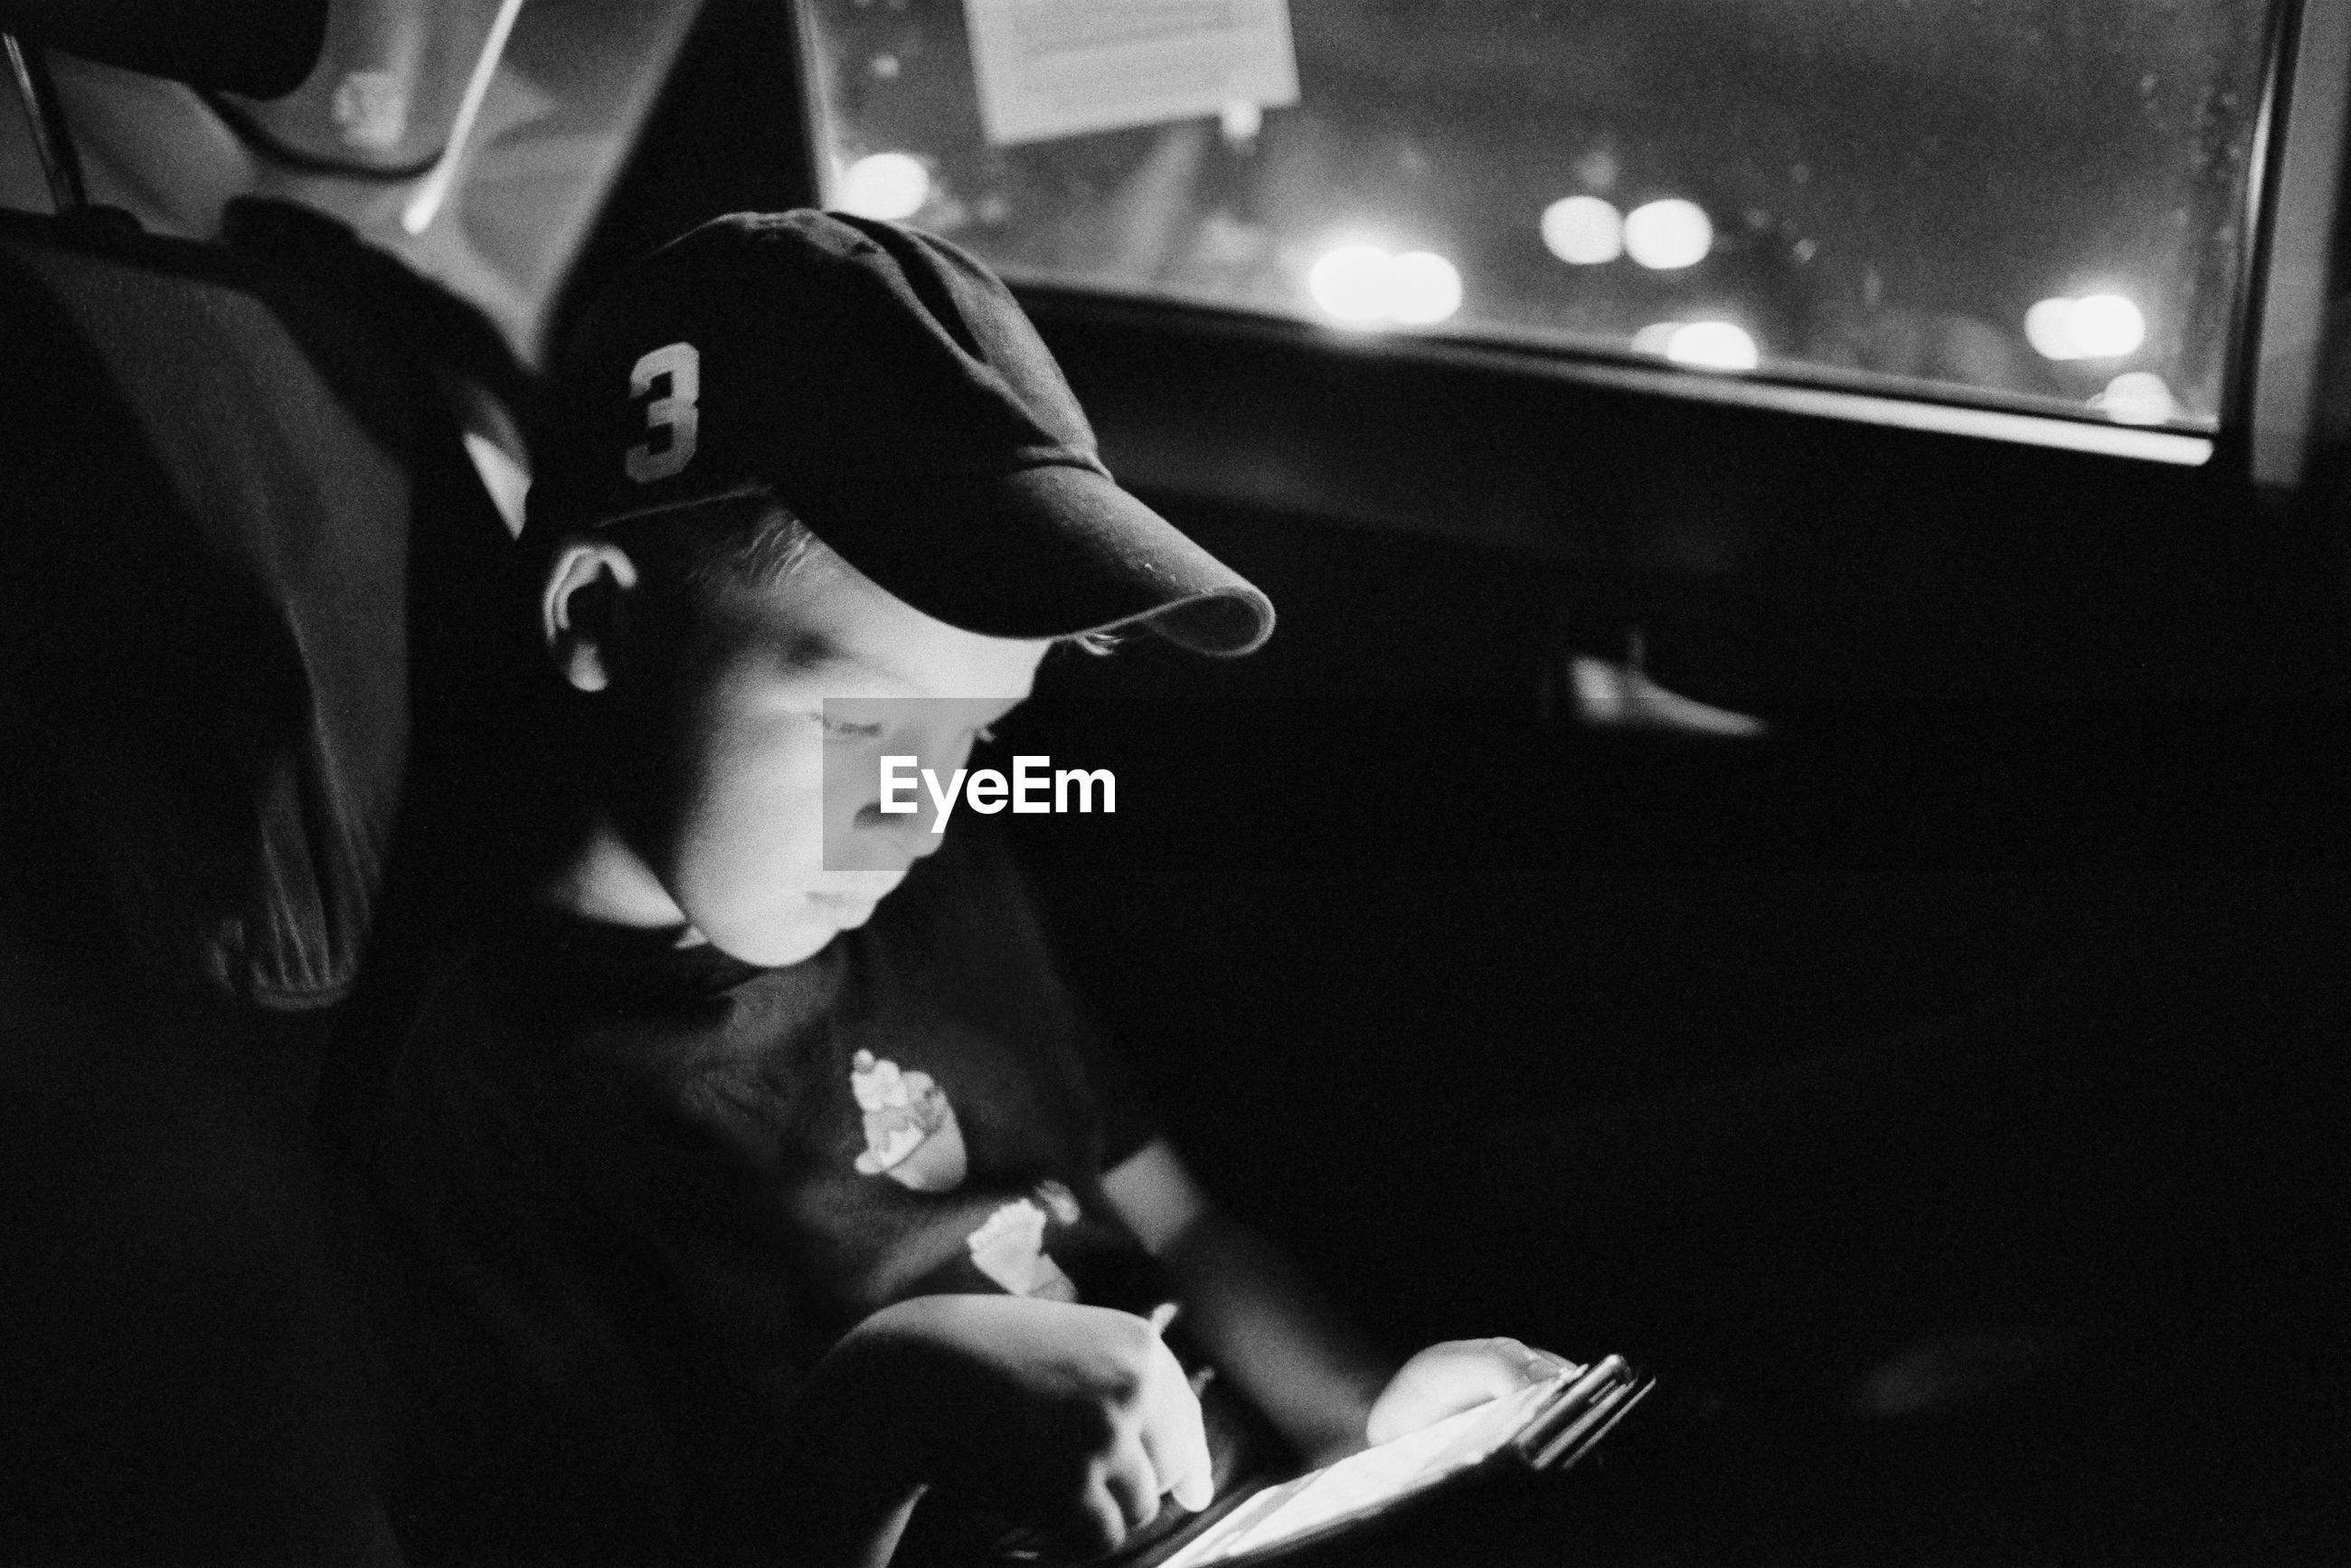 Boy wearing cap while using smart phone in car at night